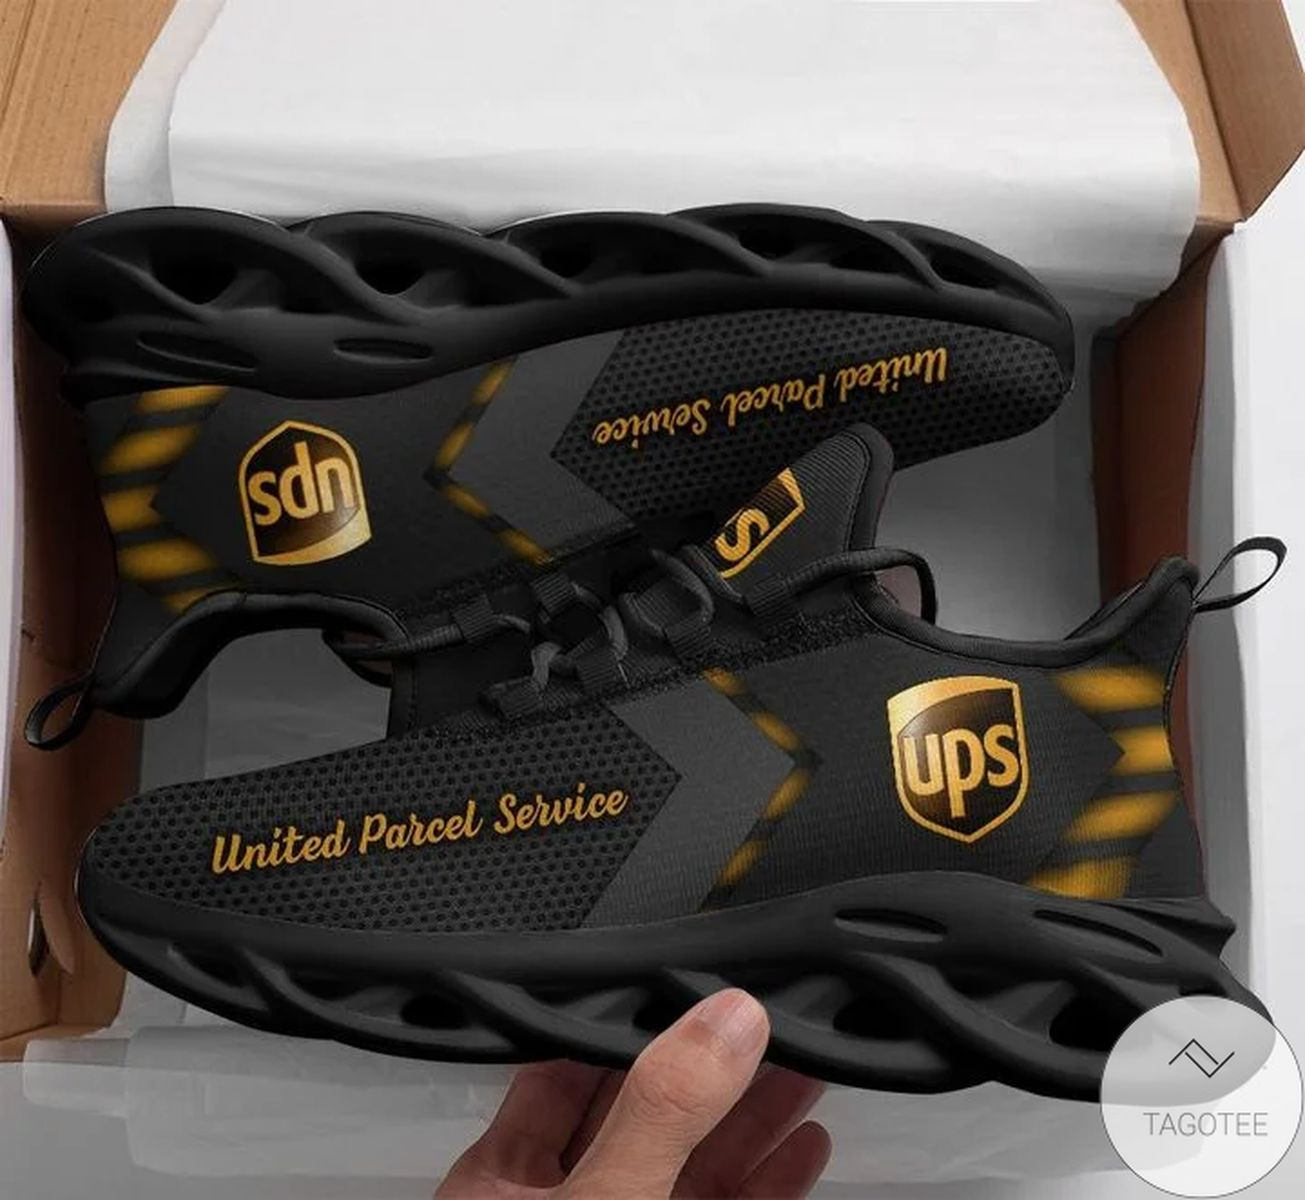 UPS United Parcel Service Sneaker Max Soul Shoes